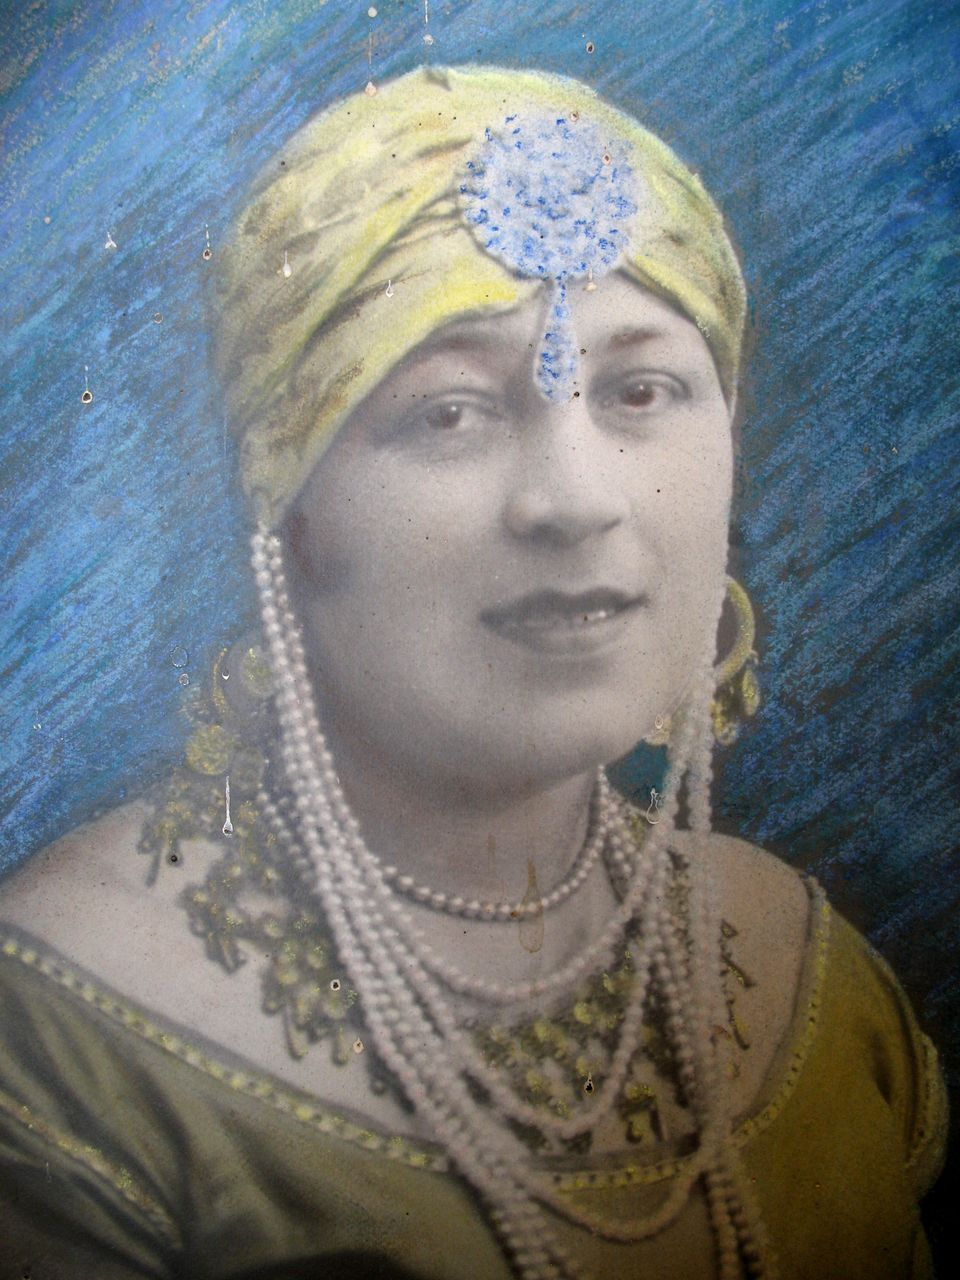 Vintage Art DECO Colorized Photo LARGE 20s Portrait Lady with JEWELS Signed FANTASTIC!